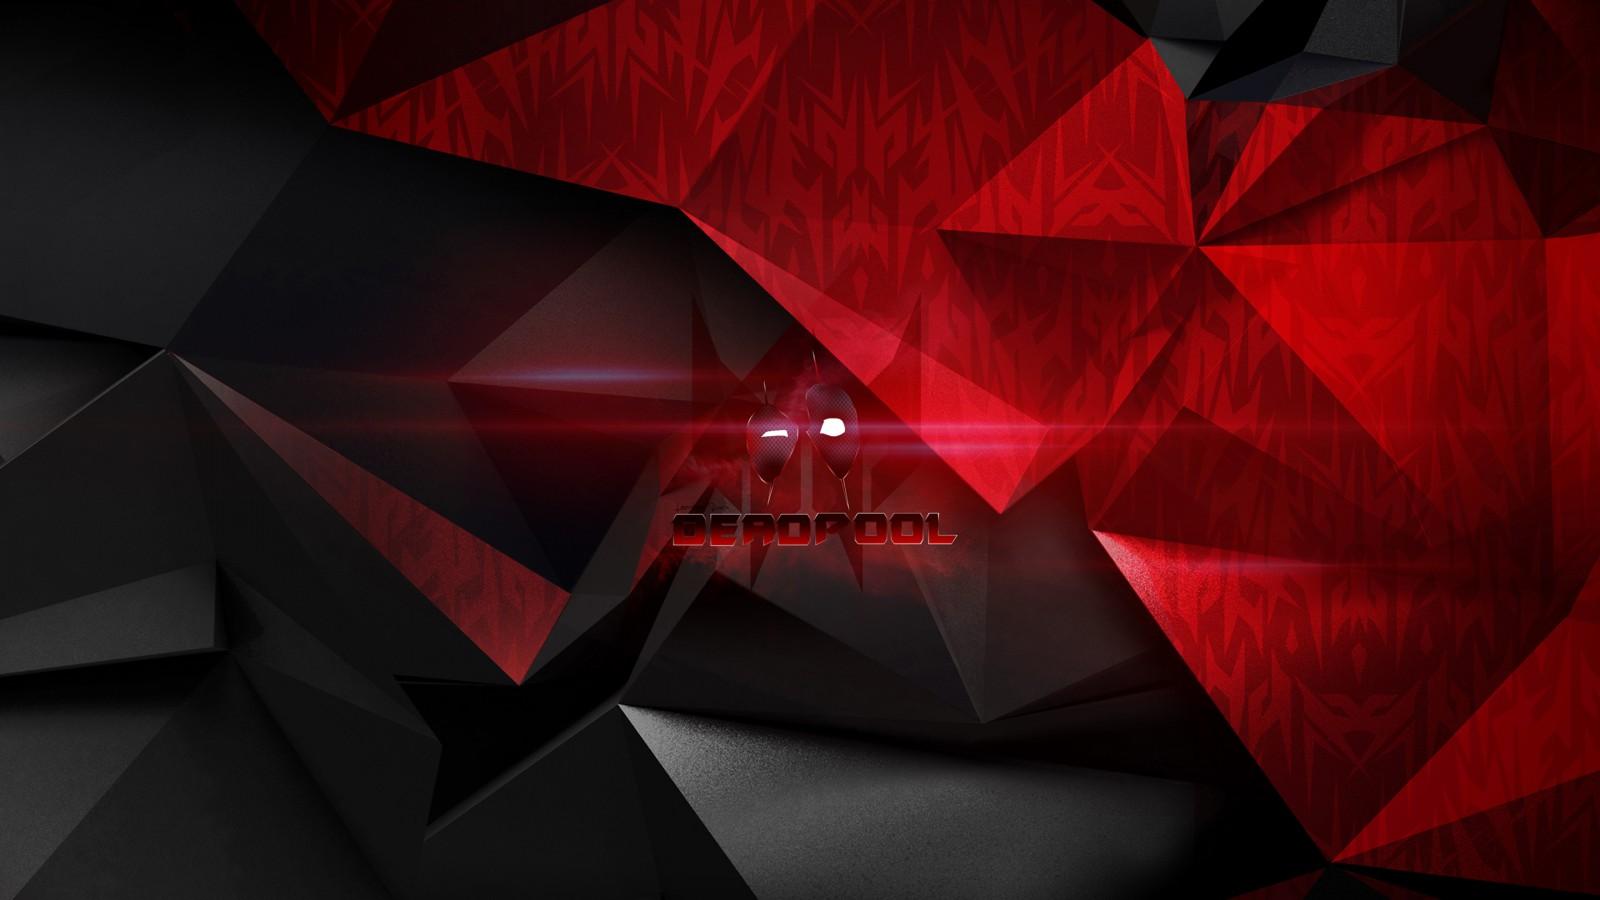 Asus 3d Wallpaper Hd Deadpool Abstract Fan Art Wallpapers Hd Wallpapers Id